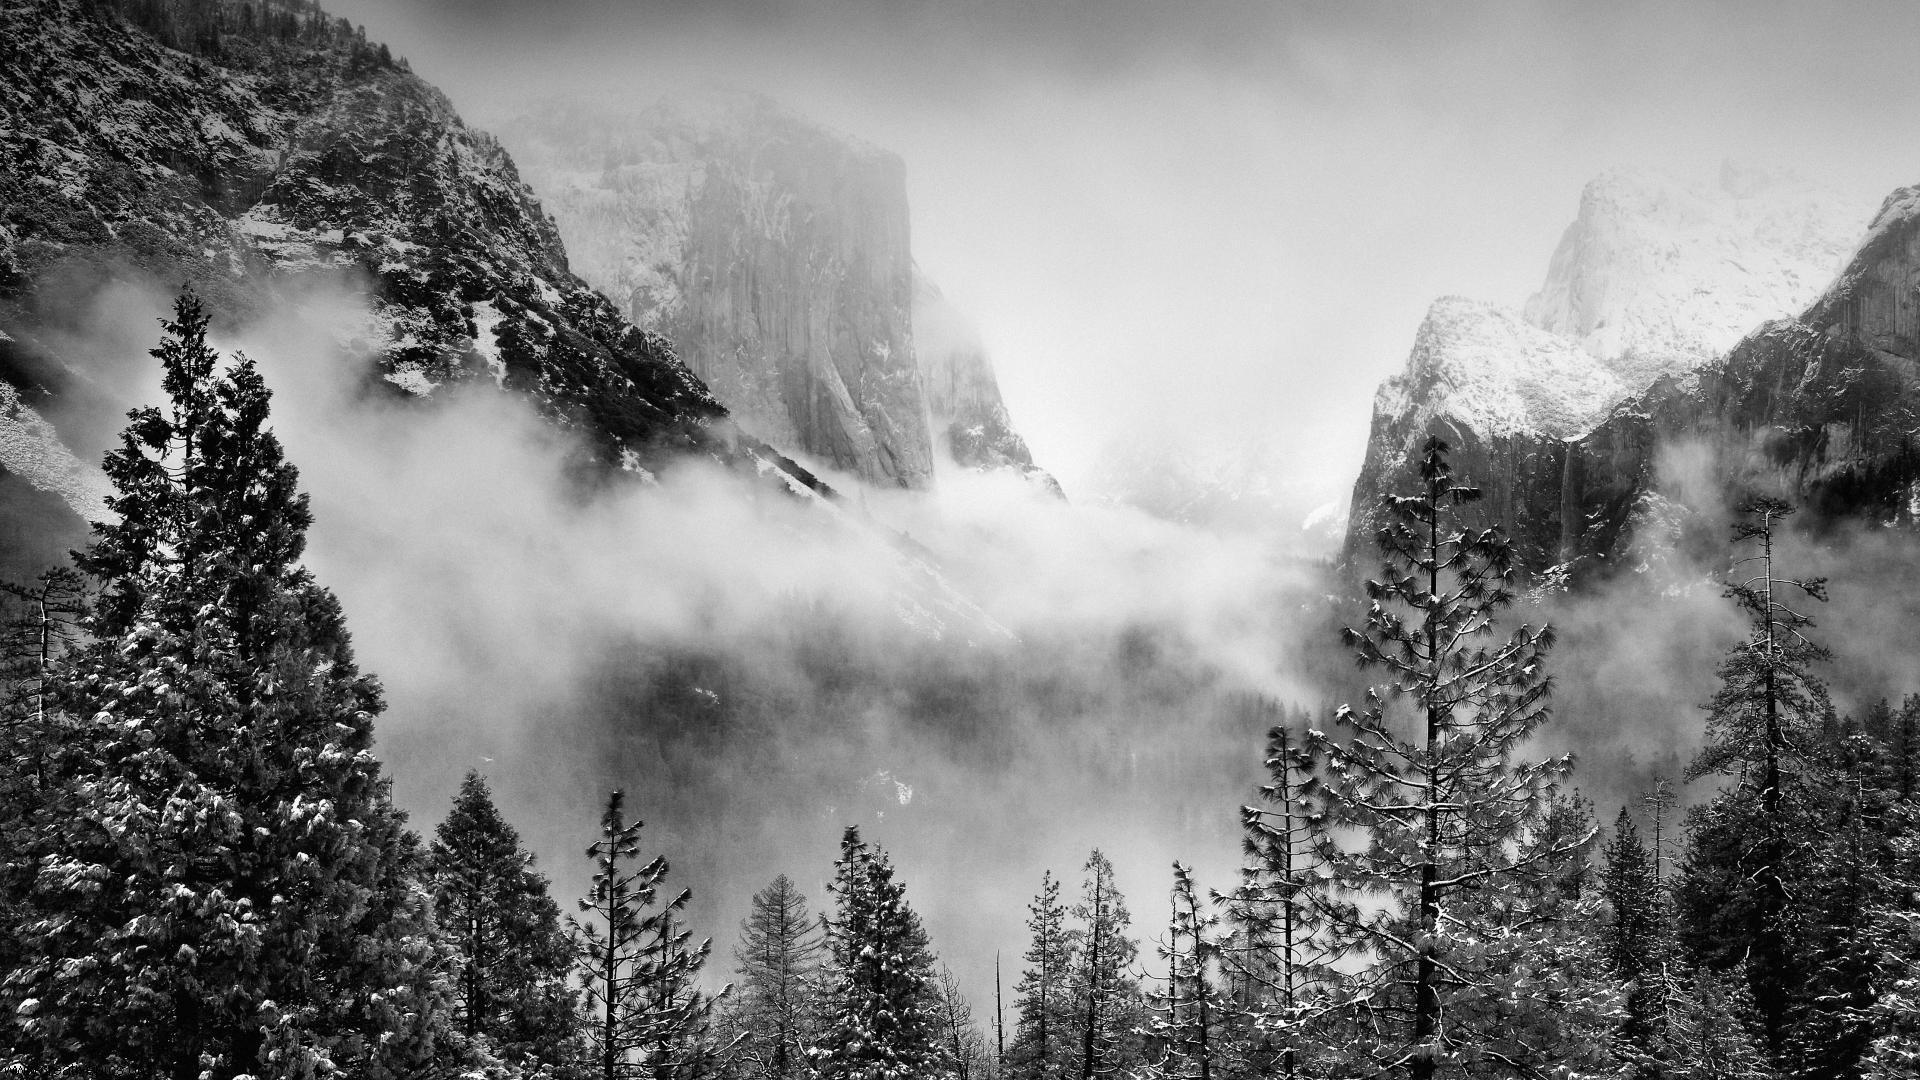 Early Winter Storm Yosemite National Park California HD Wallpaper 1920x1080